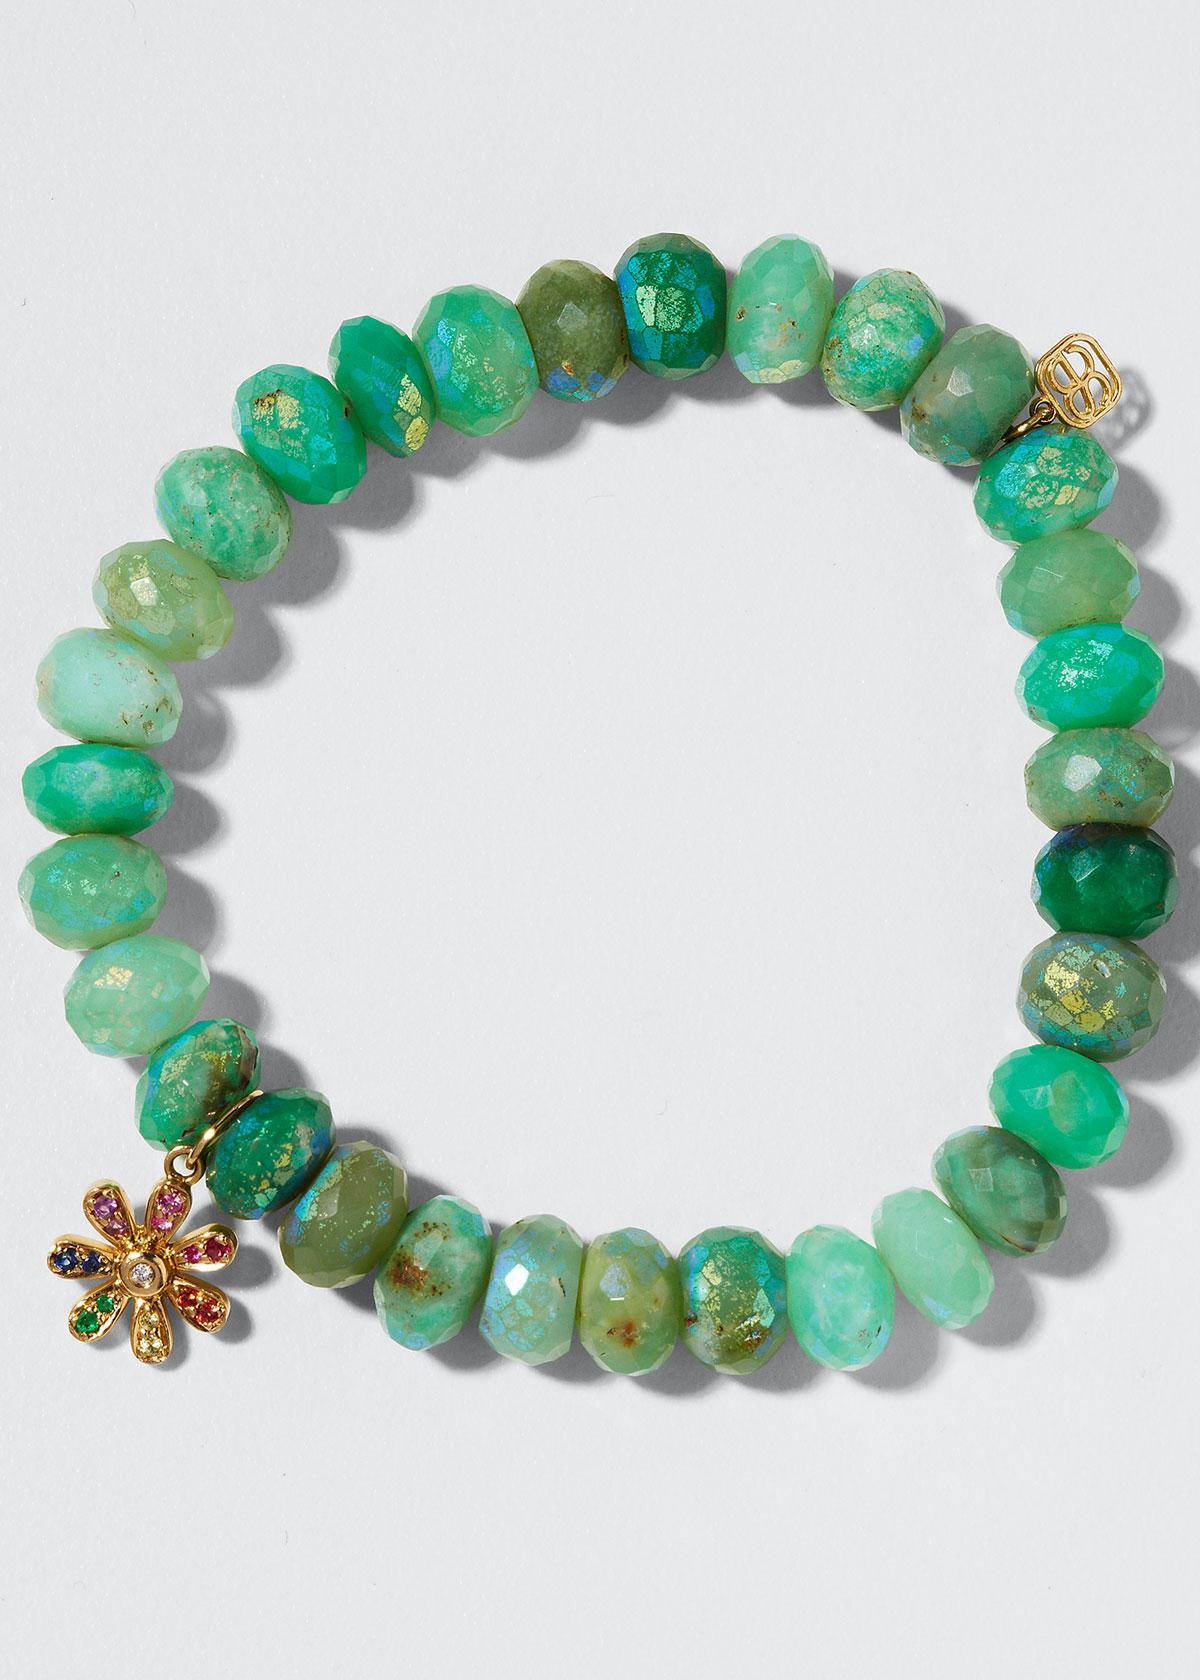 SYDNEY EVAN Bracelets 14K RAINBOW DAISY & CHRYSOPRASE BRACELET